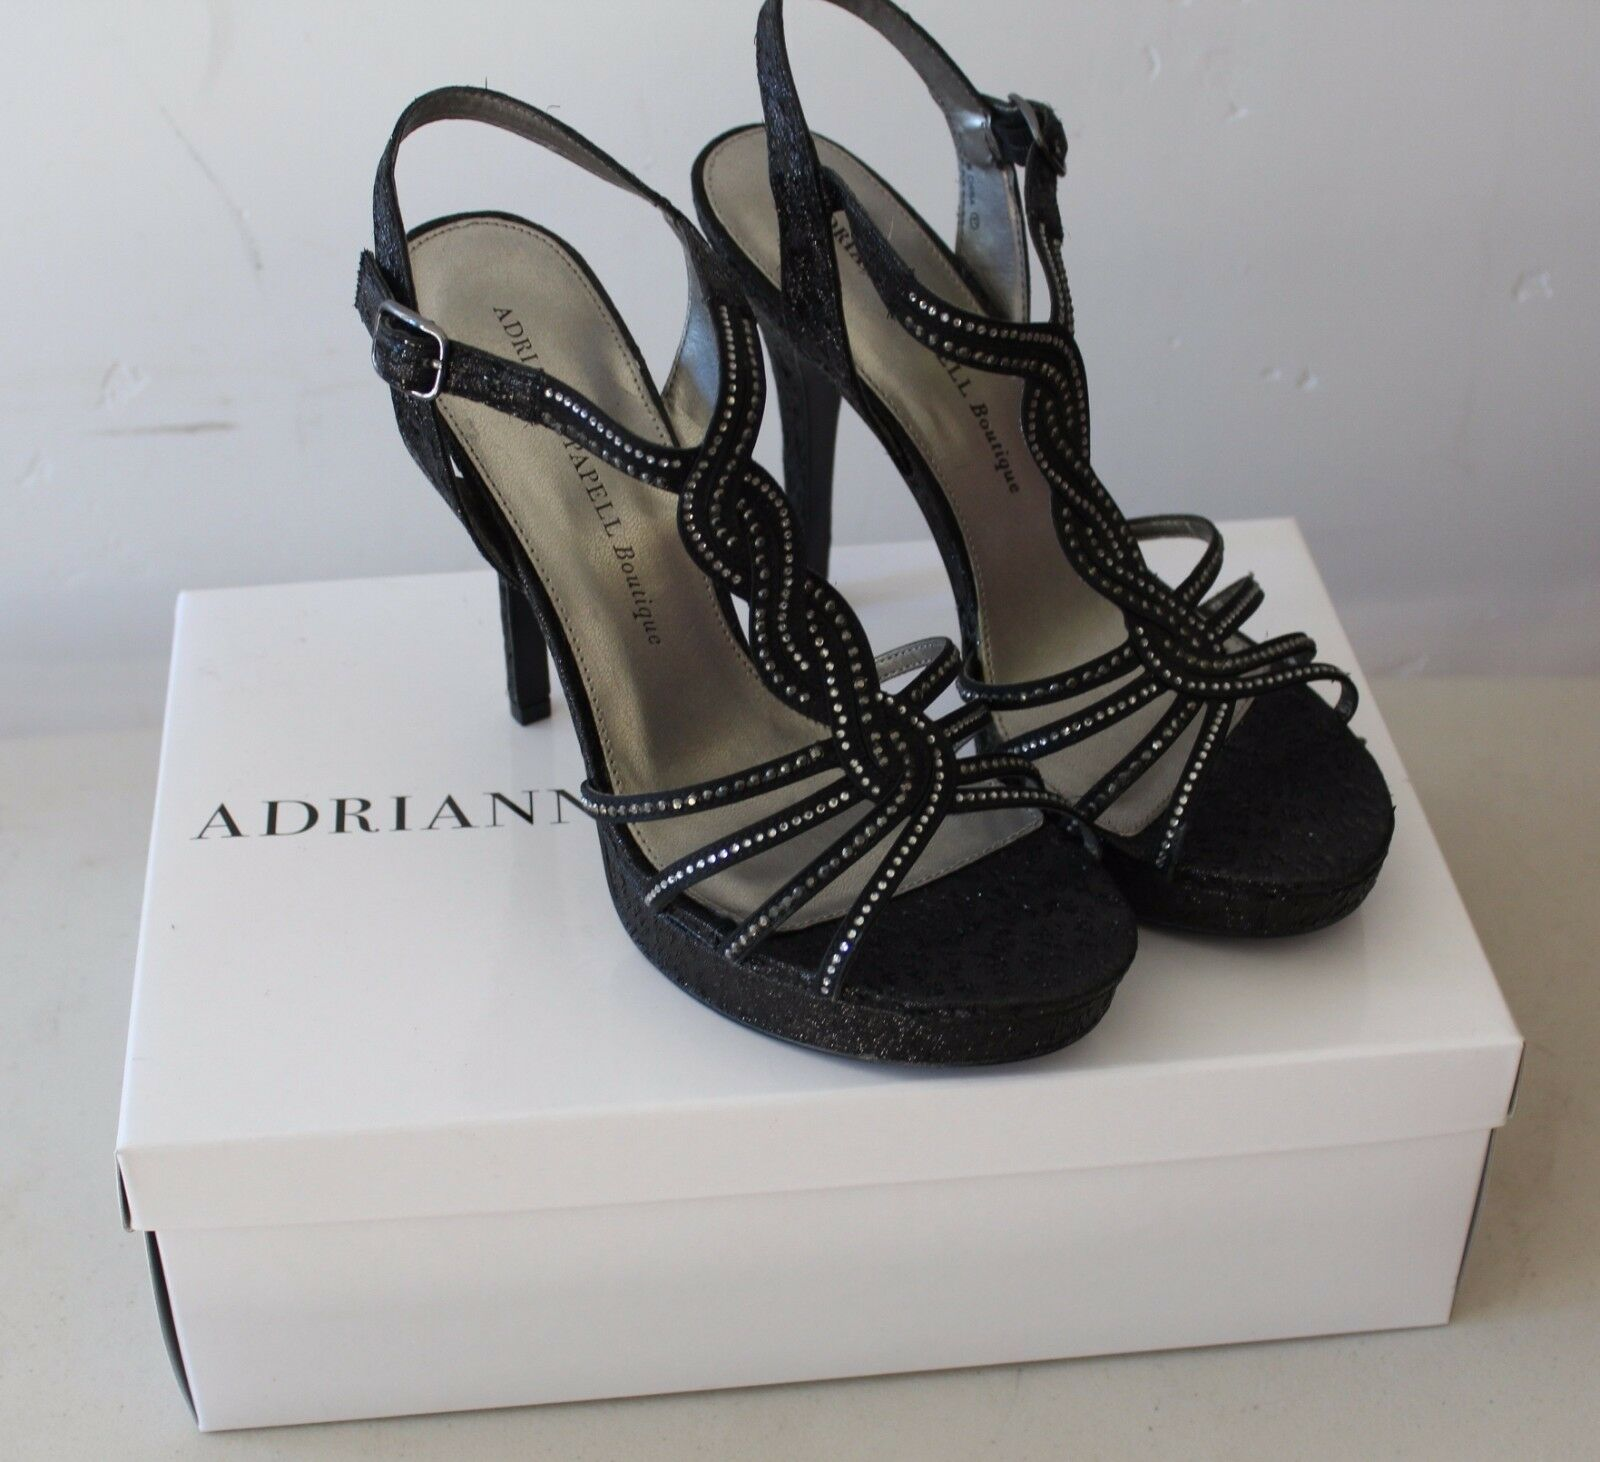 grande sconto ADRIANNA PAPELL nero Open Toe Heels Mandy Sz 9M 9M 9M NWB  S13  acquista marca